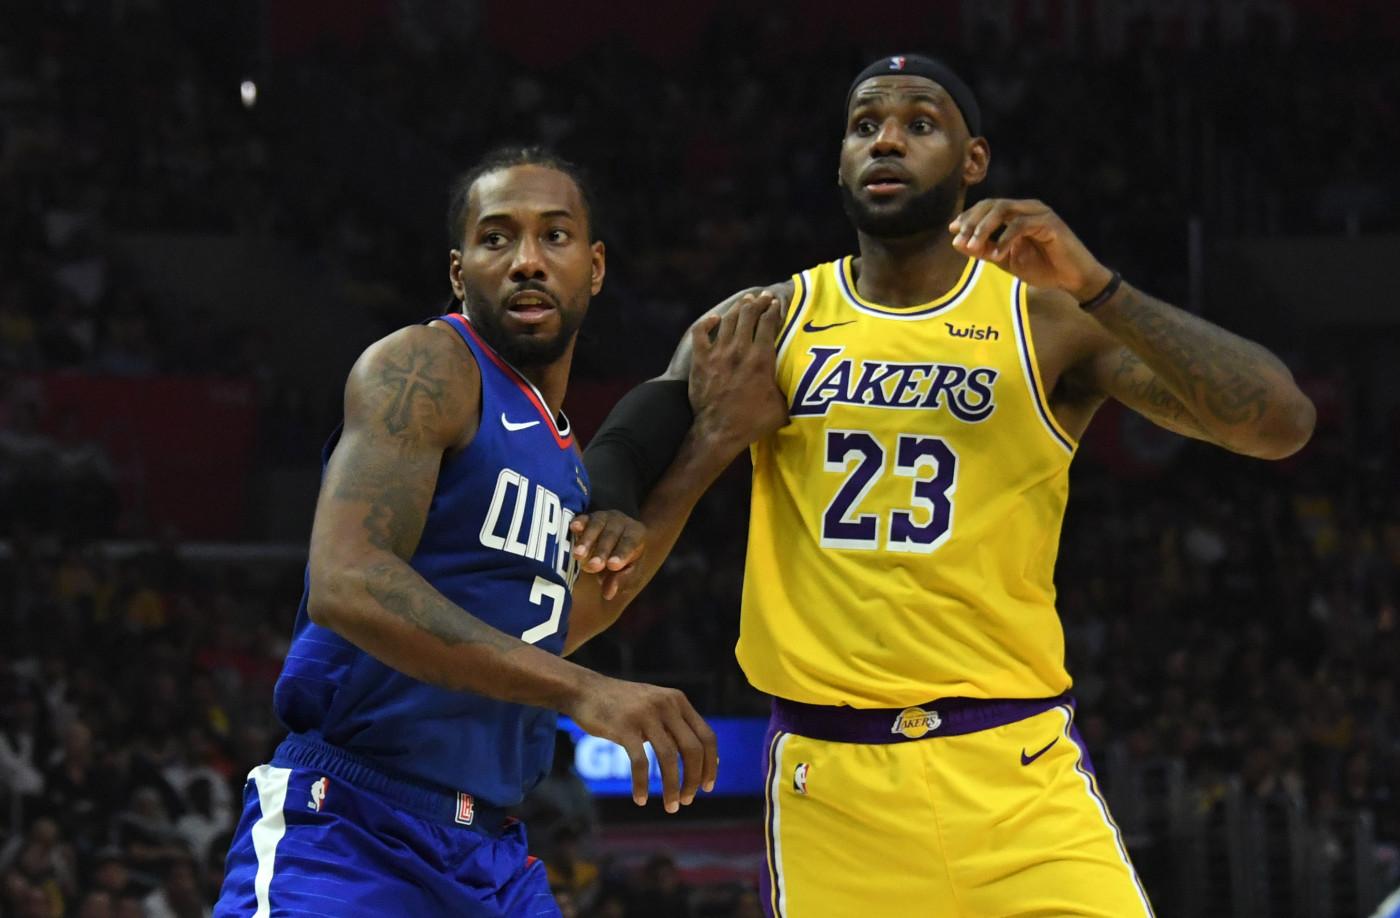 Kawhi Leonard LeBron James Lakers Clippers 2019 October